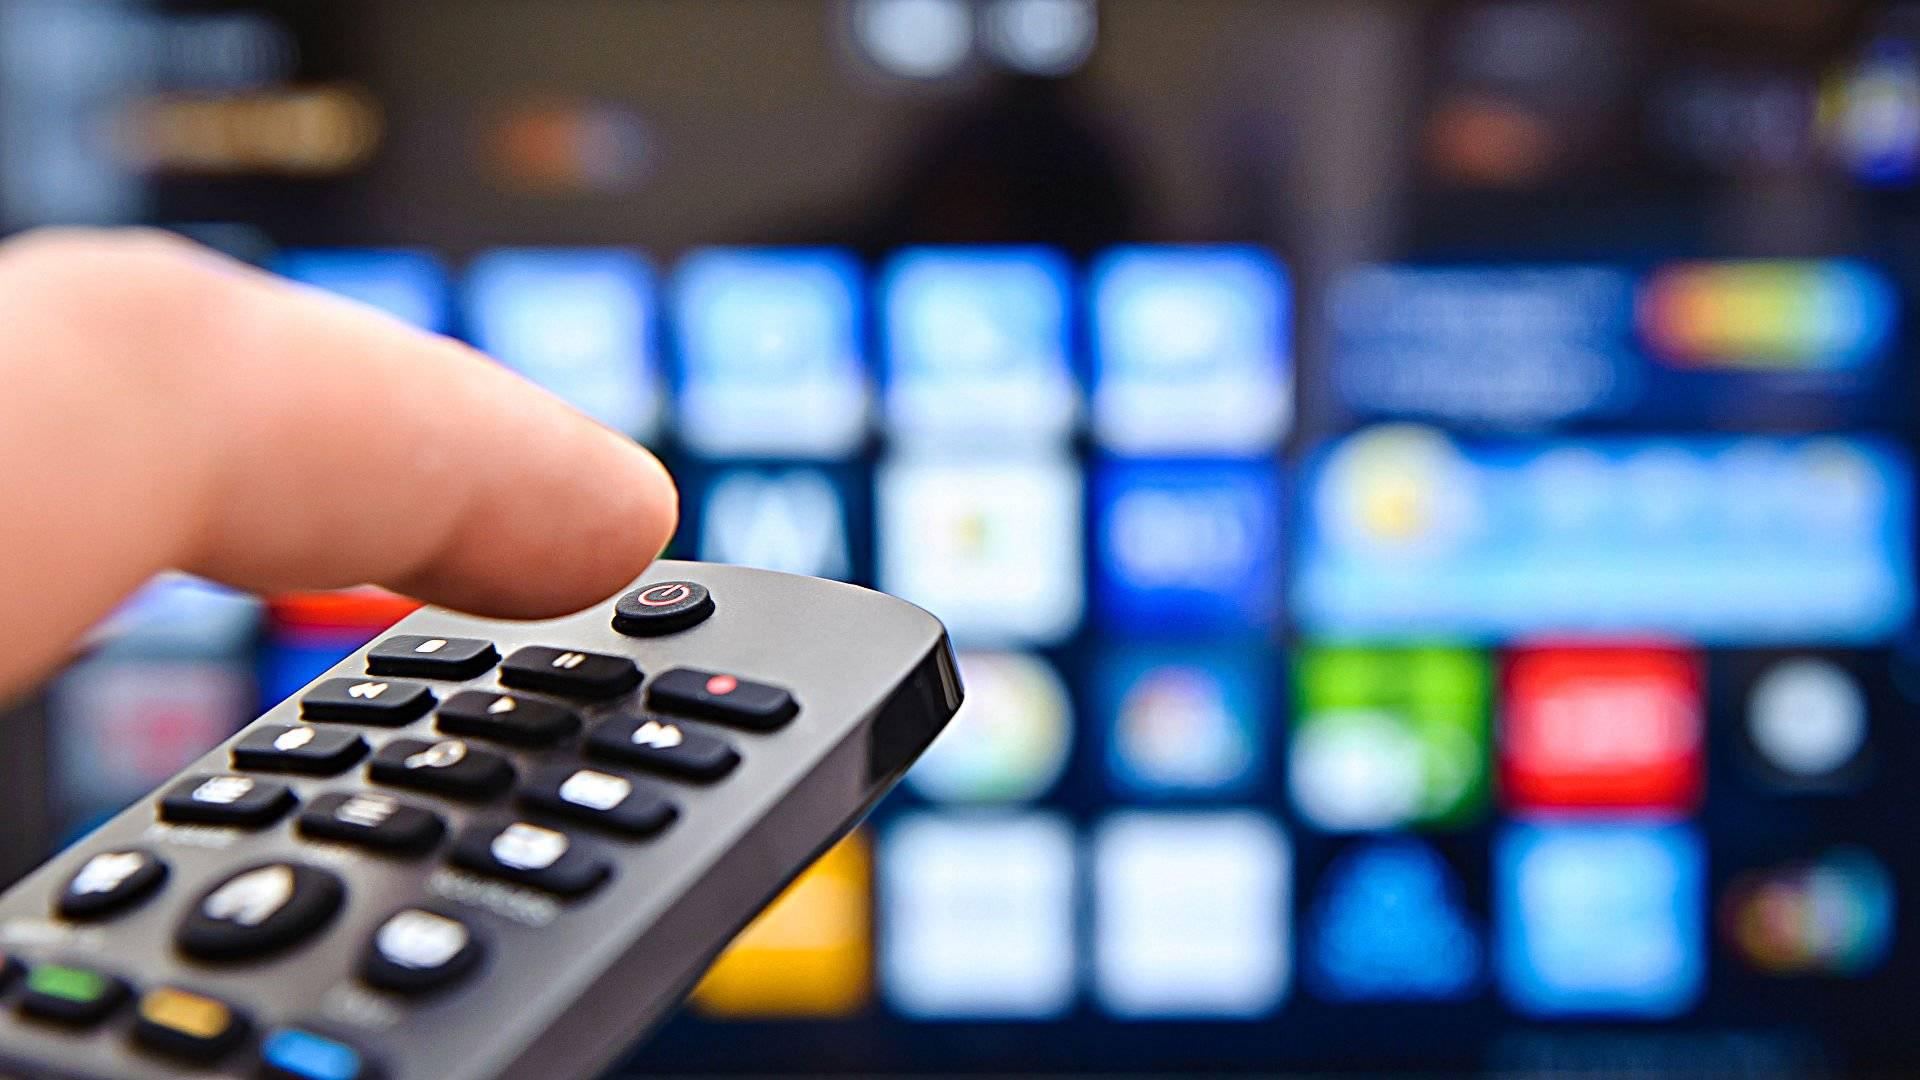 Telewizja cyfrowa IPTV